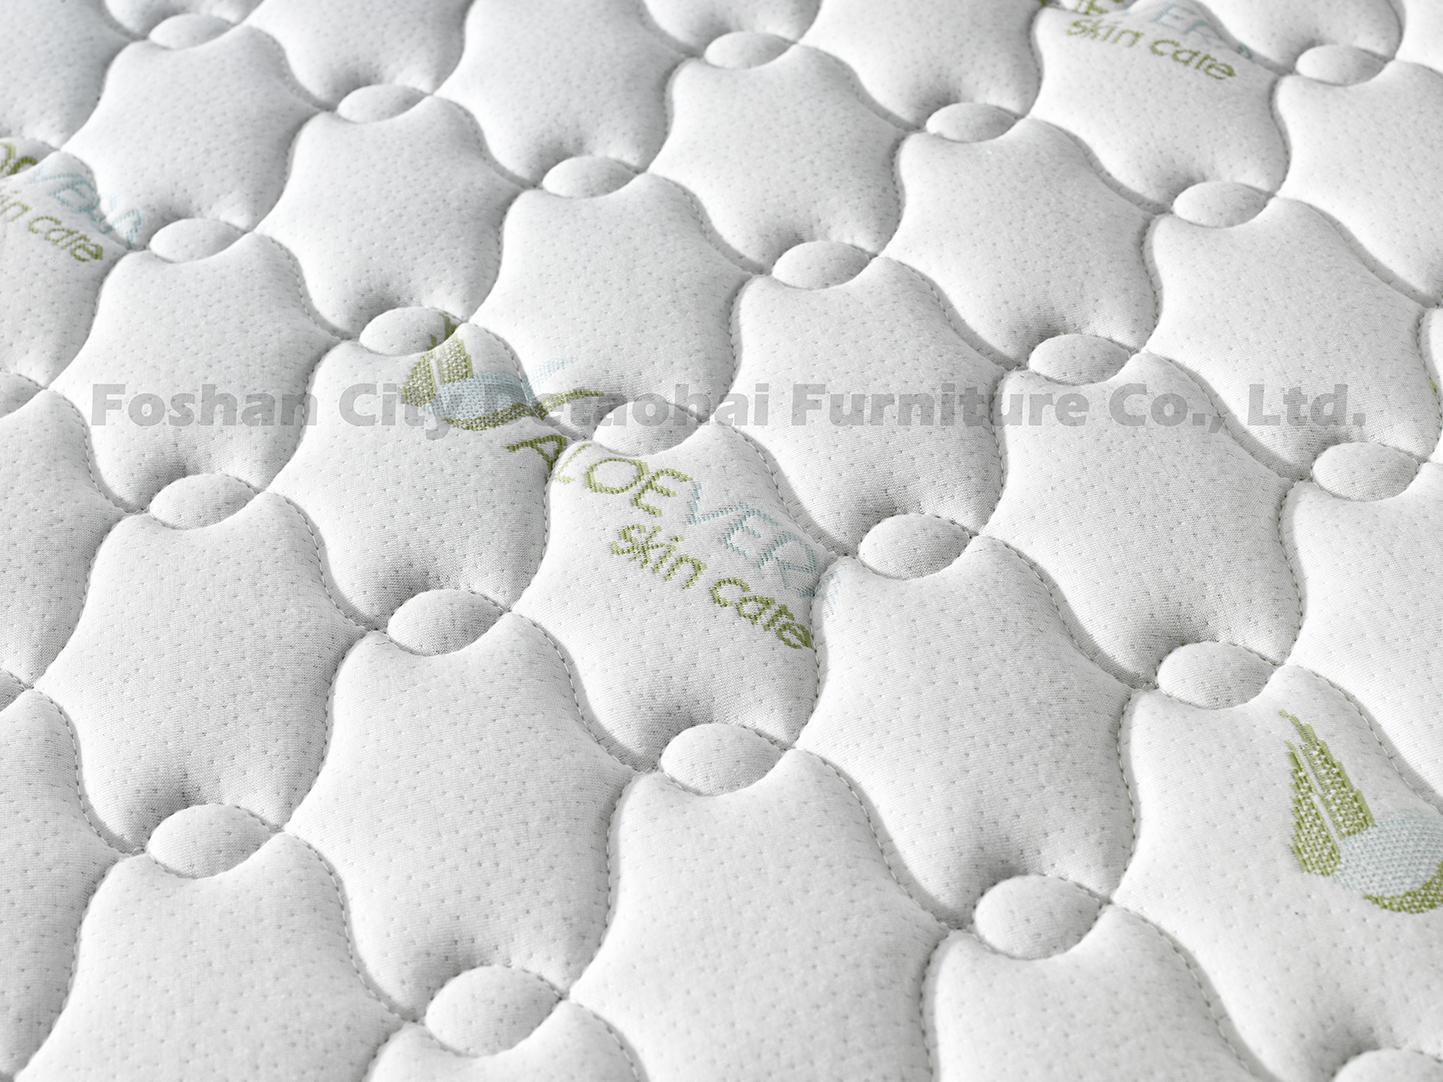 pocket spring gel memory foam mattress bedroom mattress 2